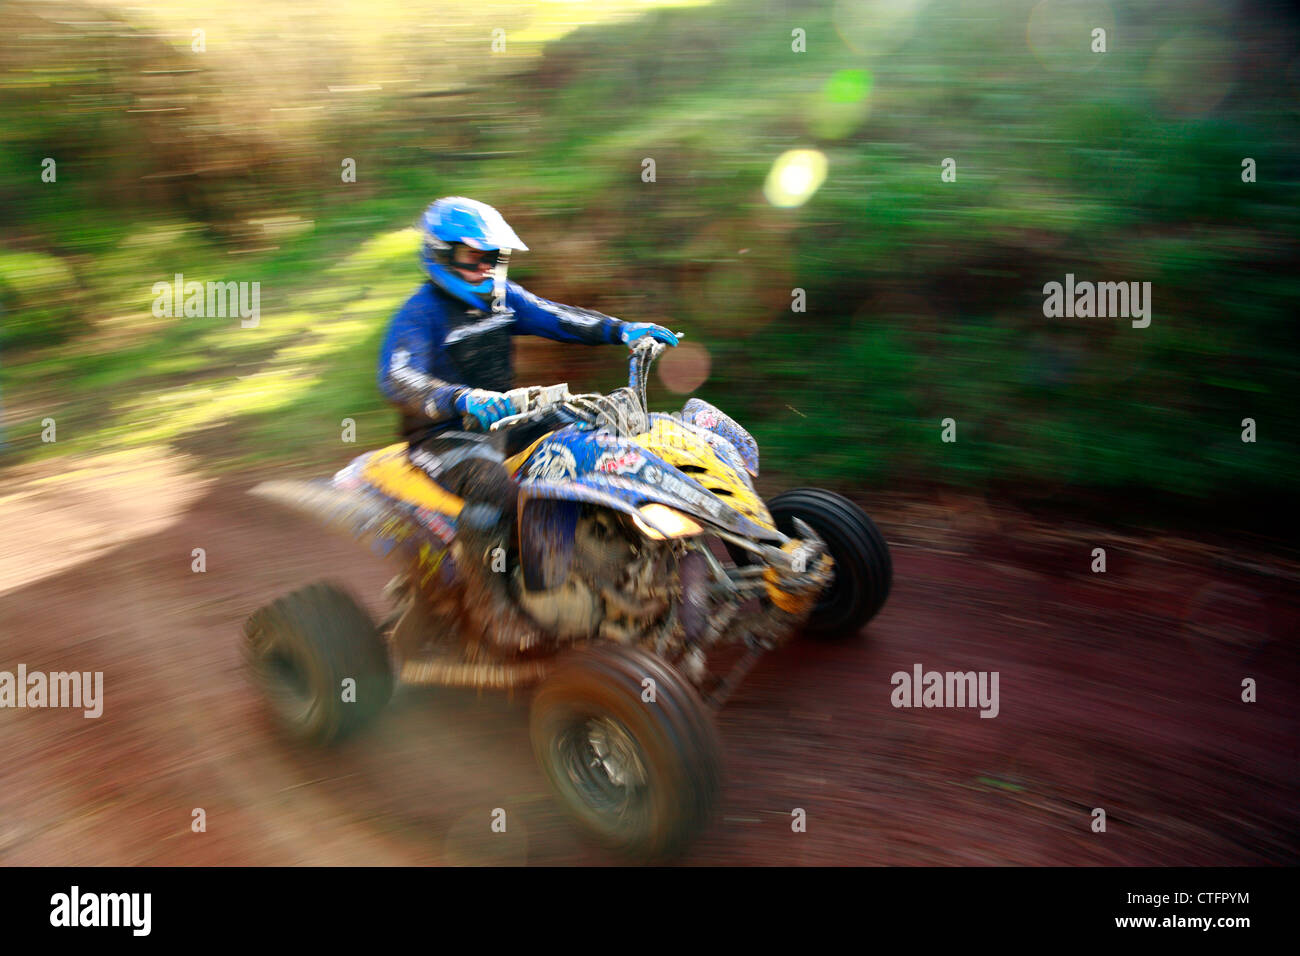 ATV offroad racing in Sao Miguel island, Azores islands, Portugal. - Stock Image